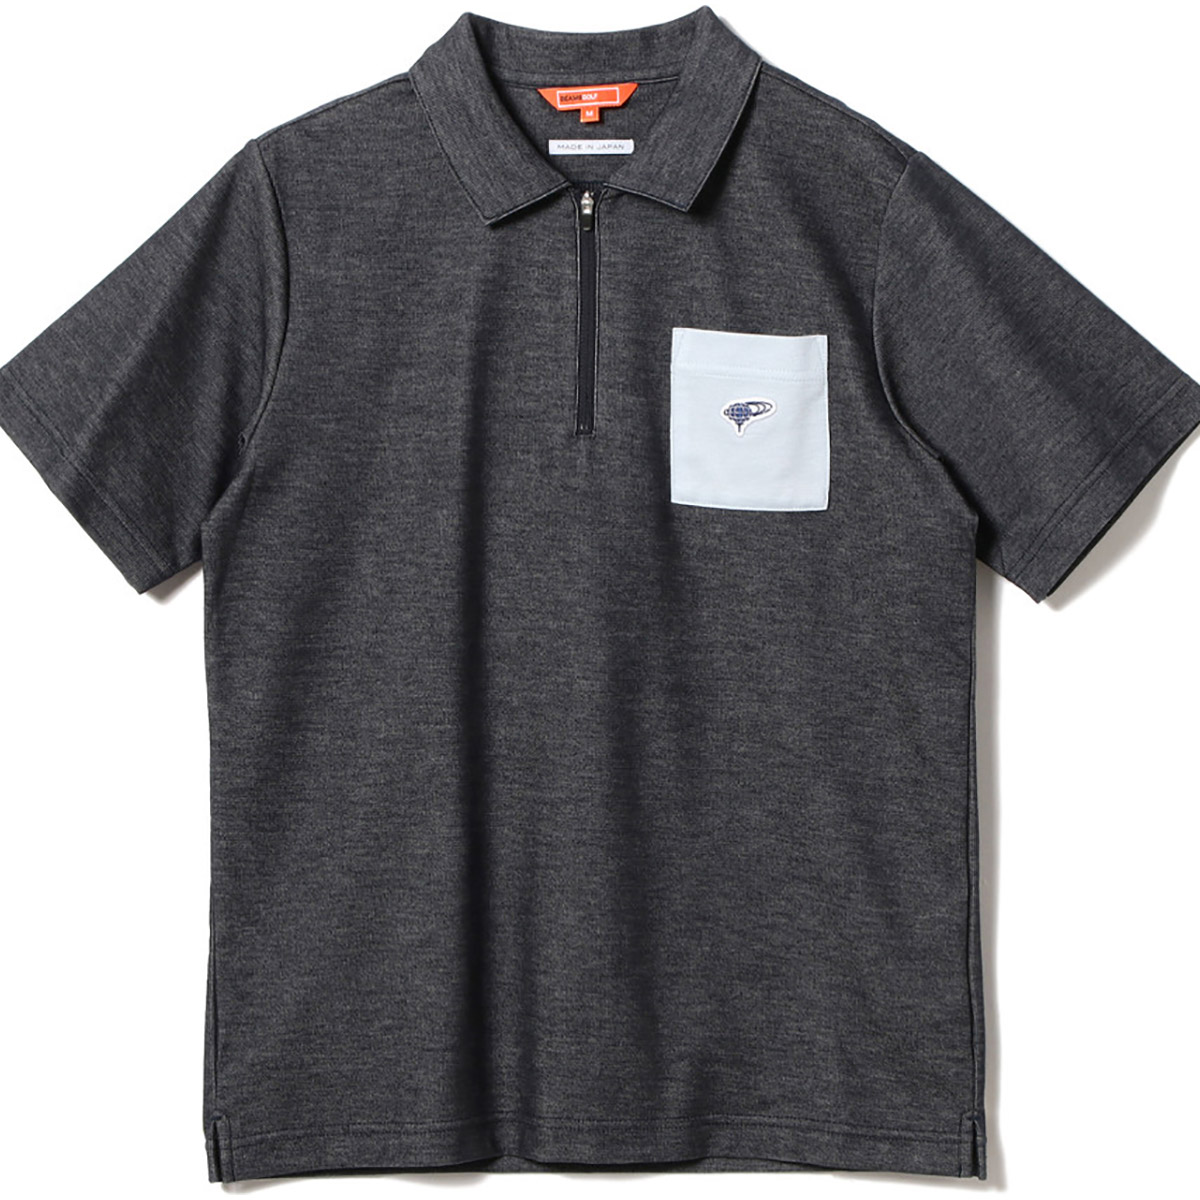 BEAMS GOLF ORANGE LABEL ブライト ポロシャツ